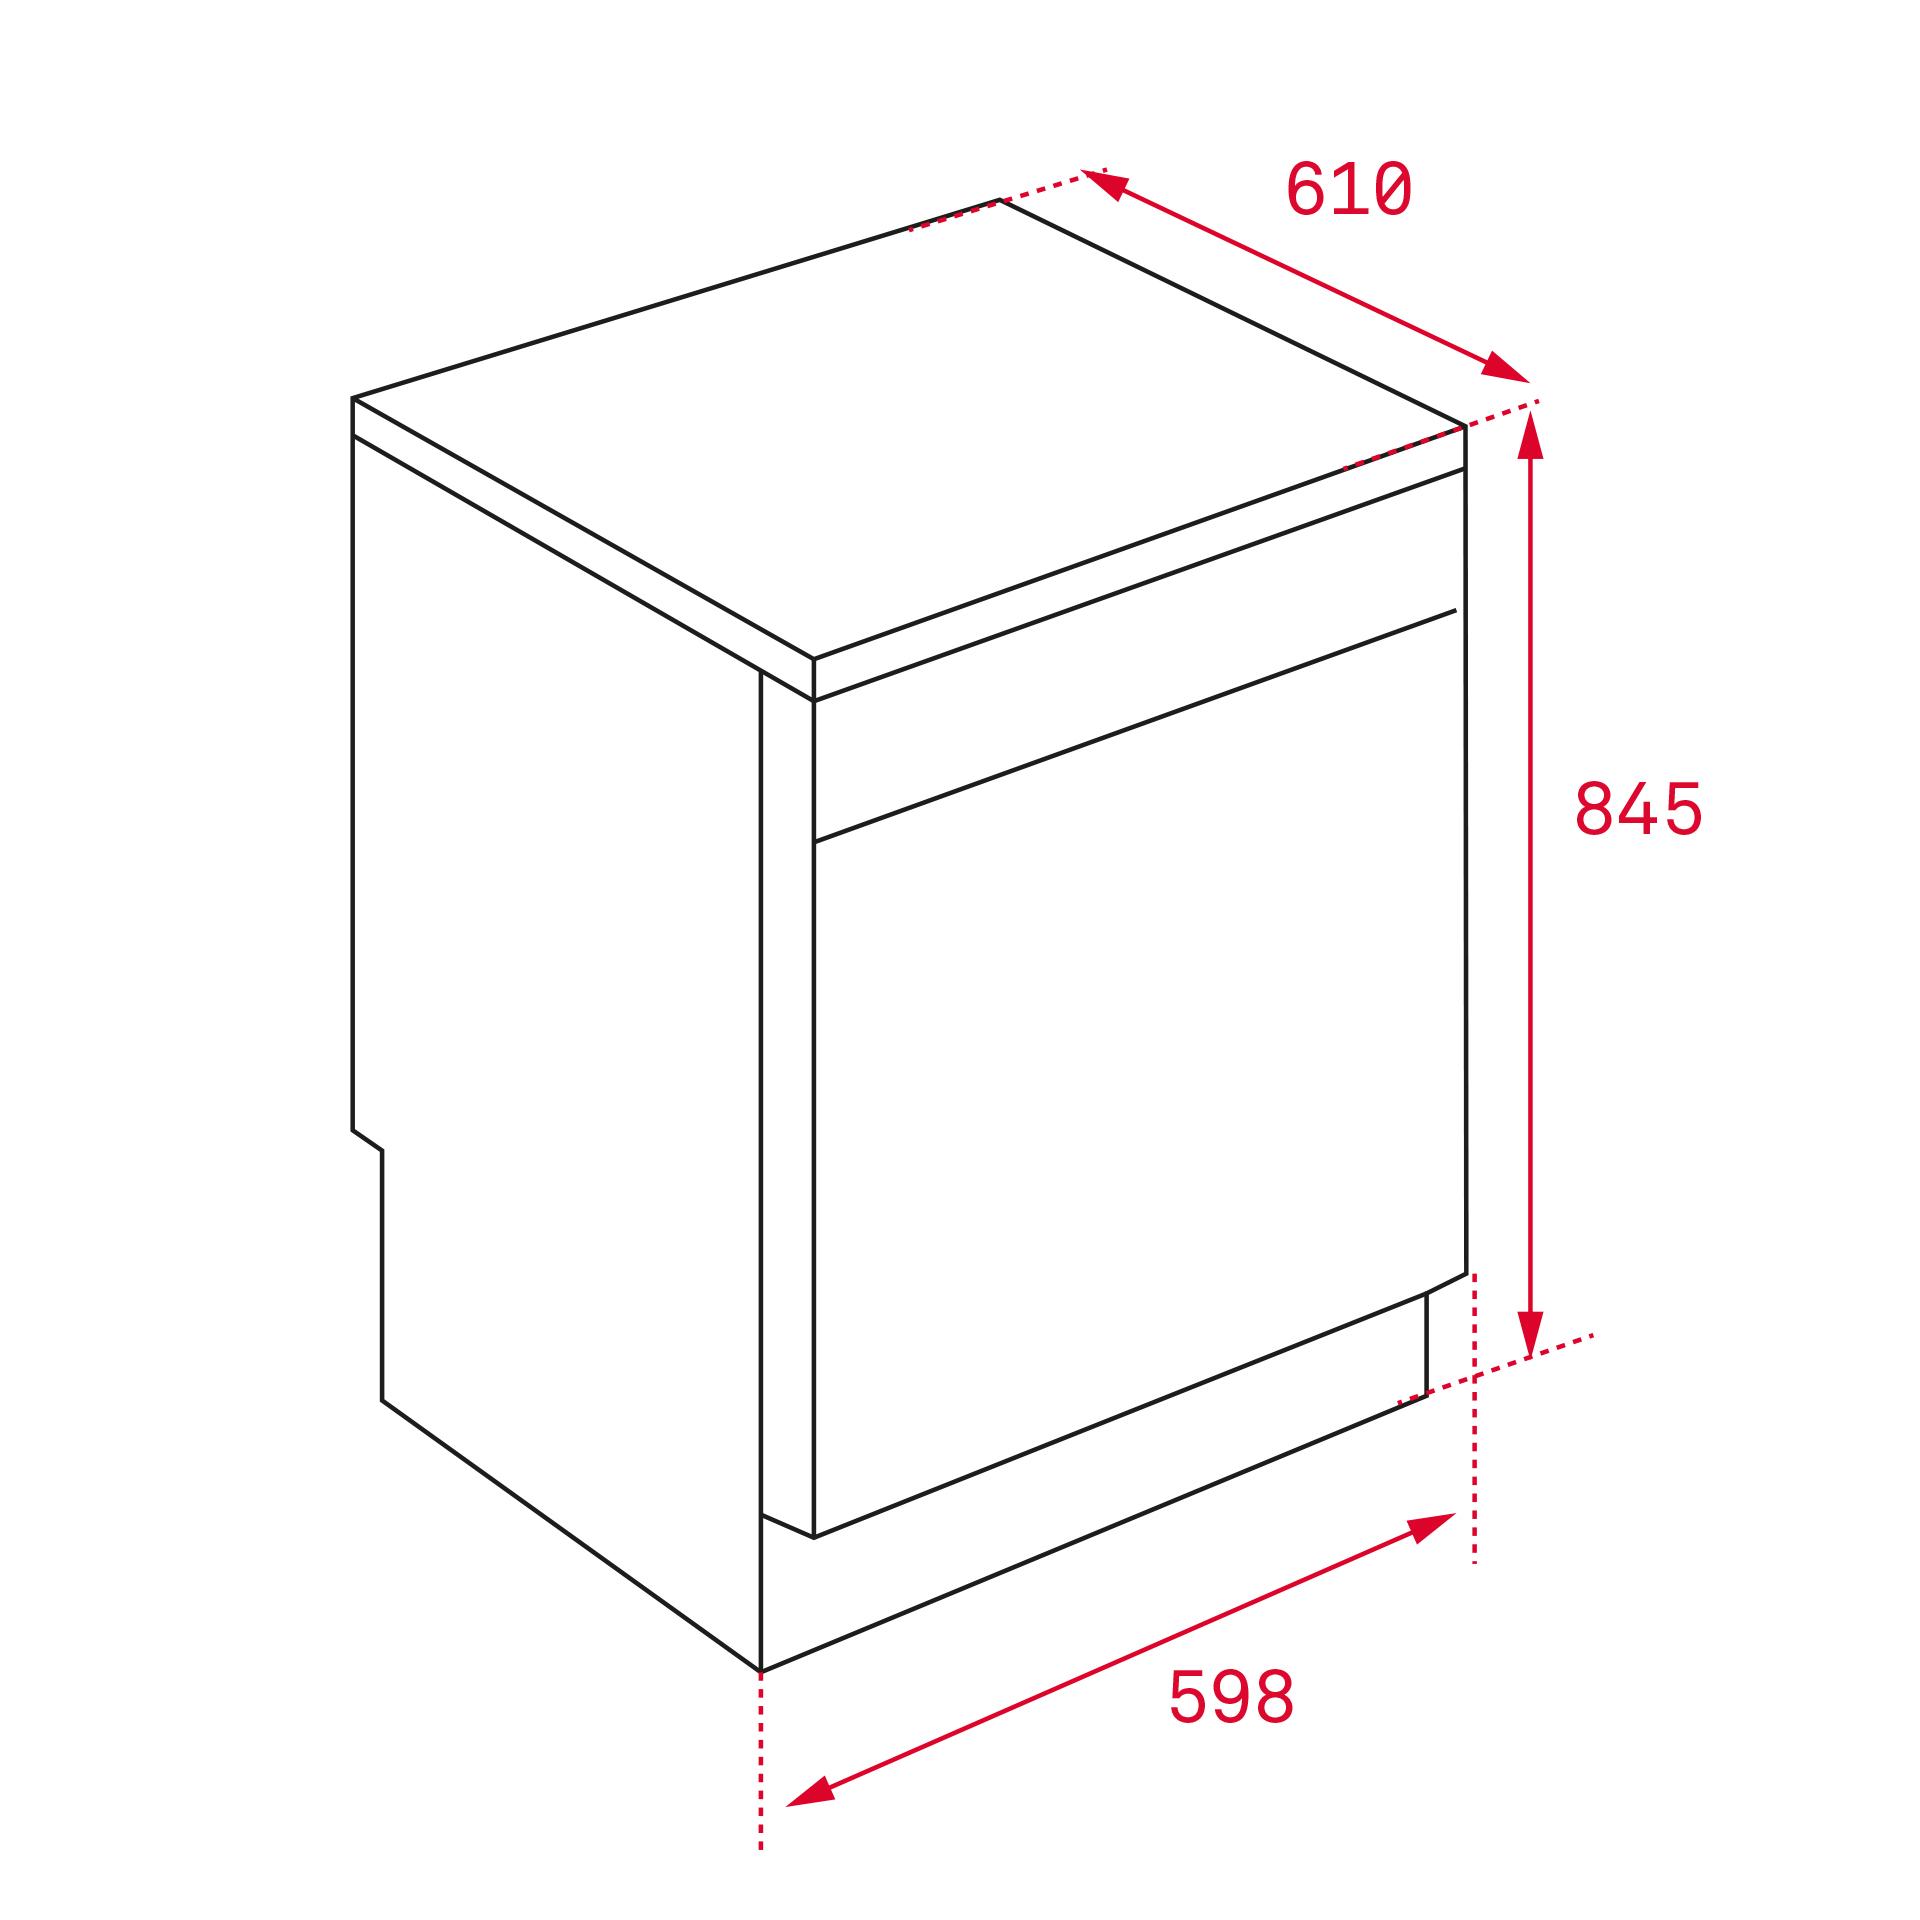 bep-gas-am-teka-vr-90-4g-ai-tr-al.jpg_product_product_product_product_product_product_product_product_product_product_product_